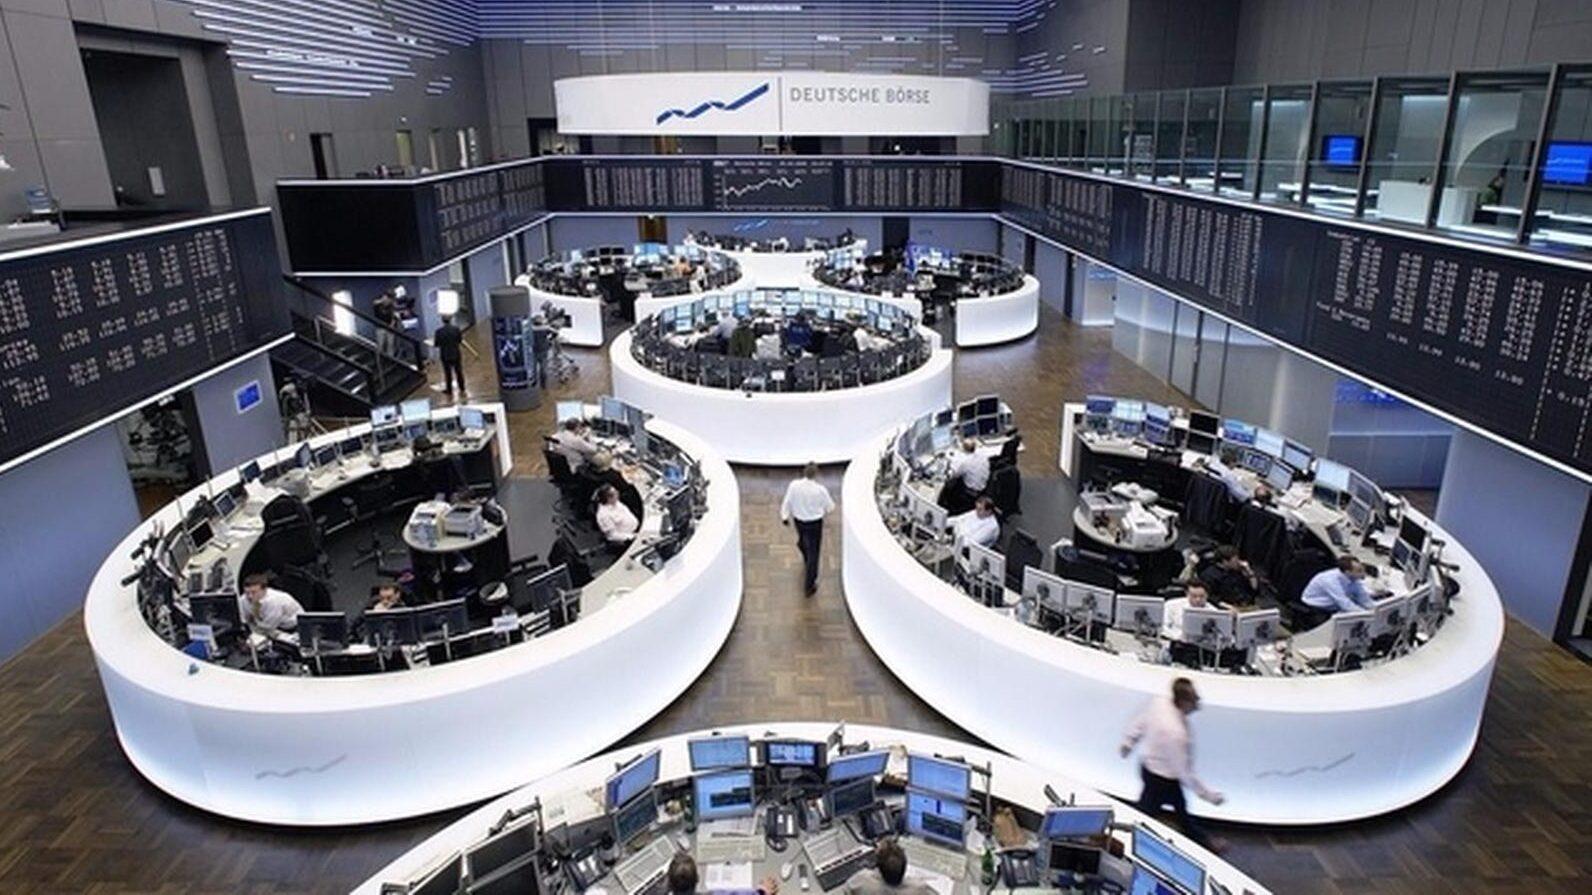 Google abandons Plex banking play | Microsoft rolls out financial services cloud | Deutsche Boerse launches blockchain based post-trade platform